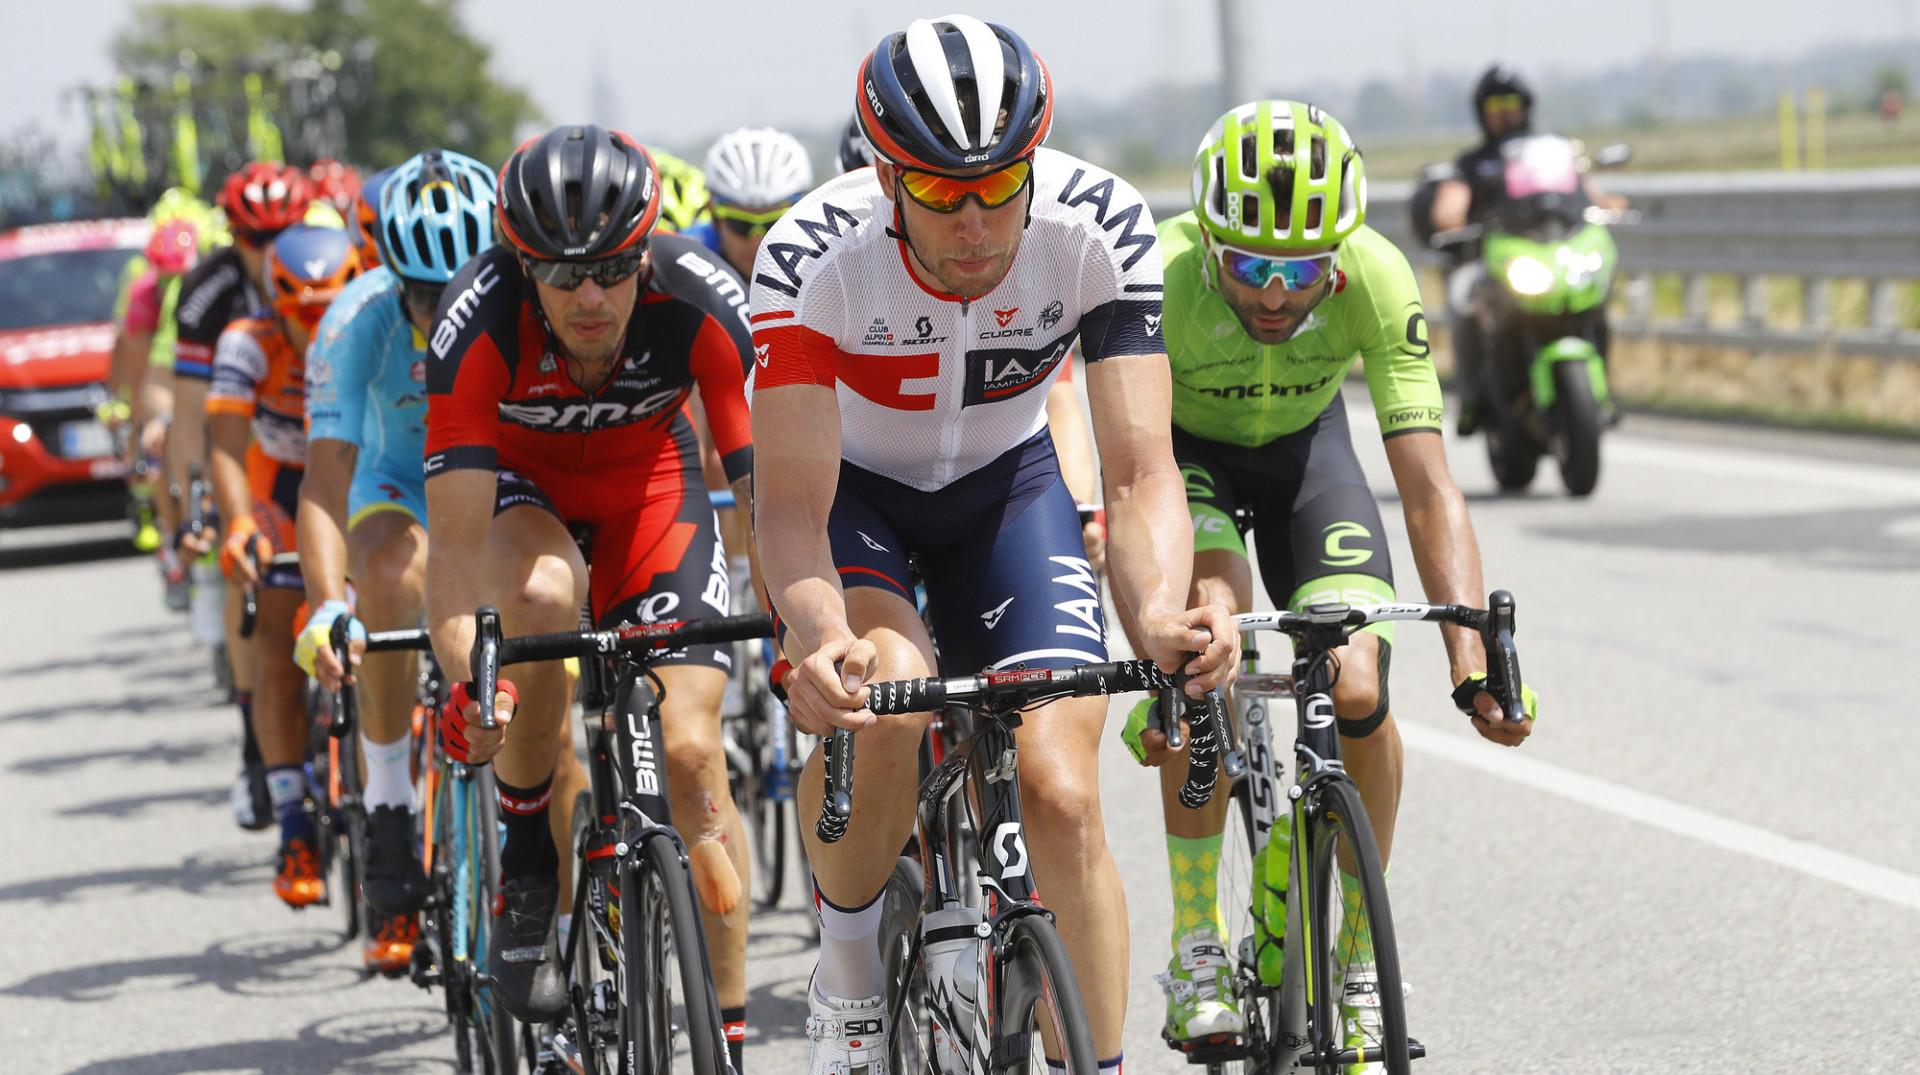 Giro tappa 18 – Un podium de plus pour IAM Cycling